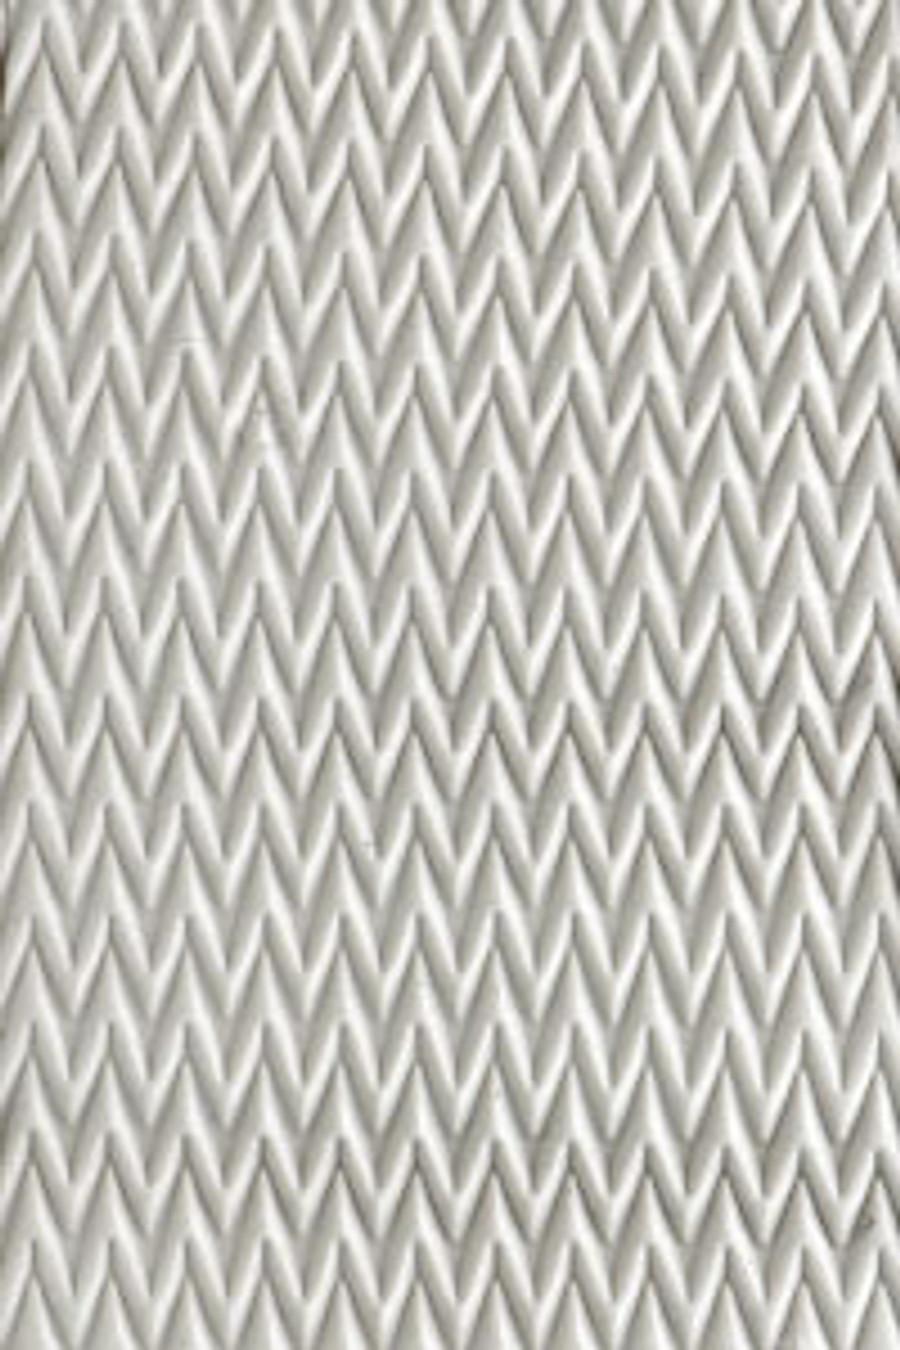 Acrylic Texture Roller - Zig Zag-A-Lot 5cm